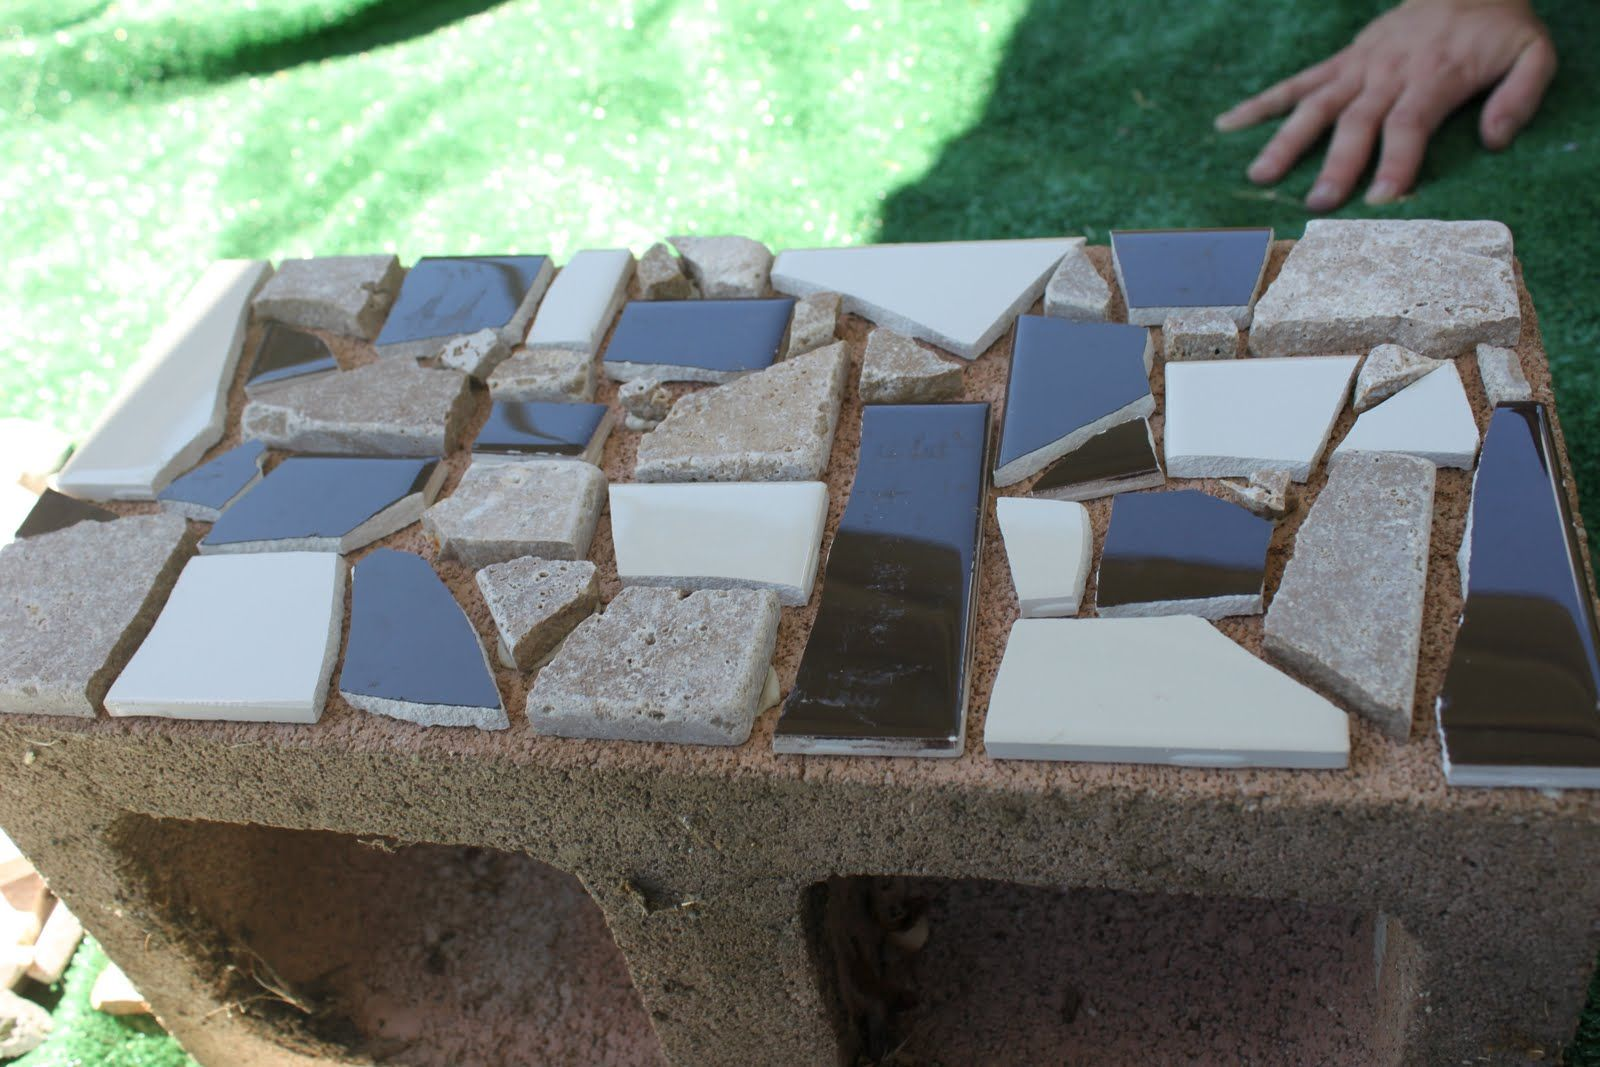 Cinder block mosaic garden box! What a great idea!